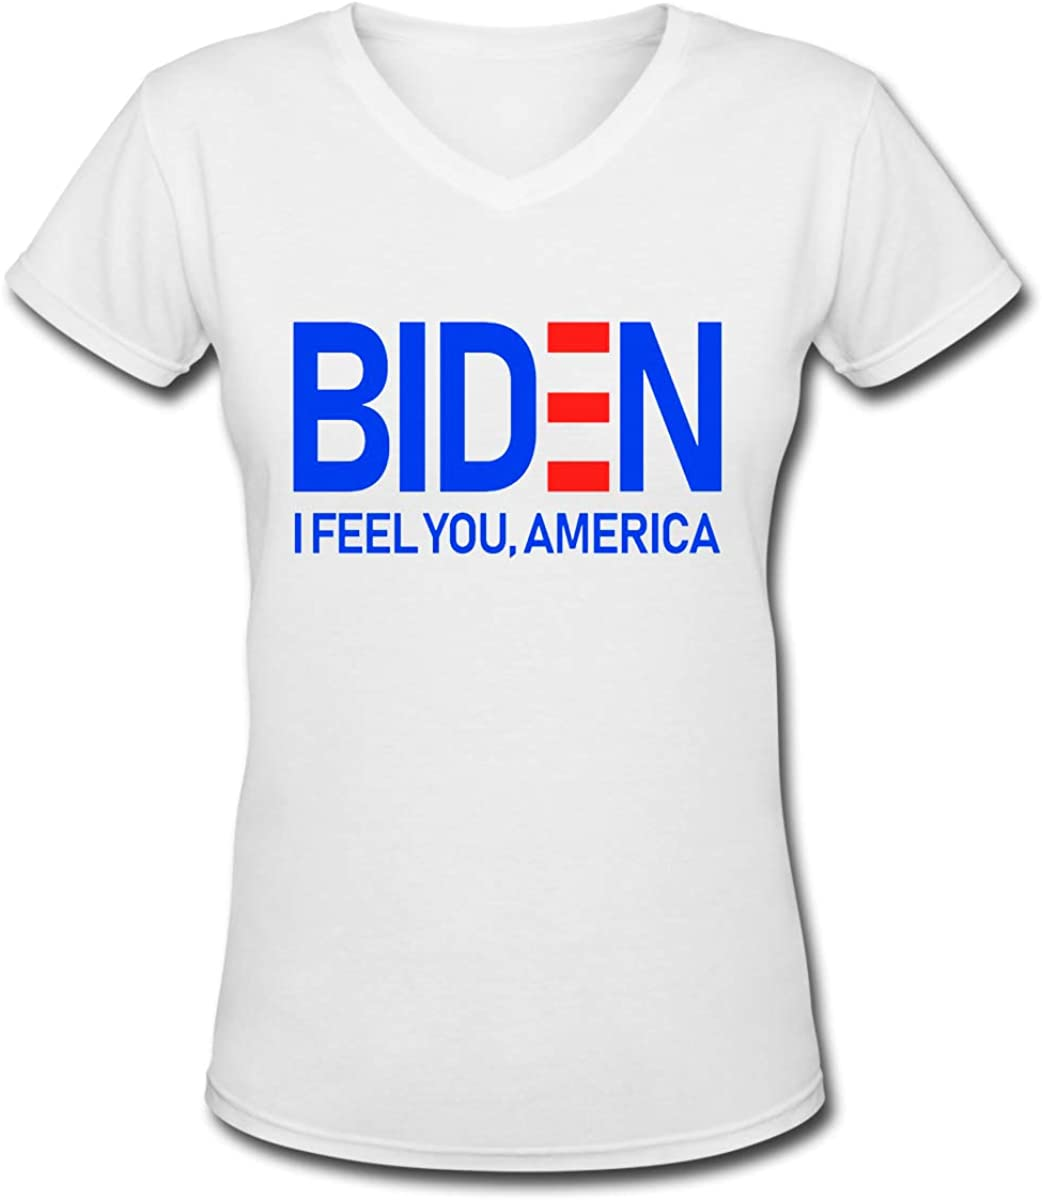 YONG-SHOP Biden Feels America Womens T Shirt Casual Cotton Short Sleeve V-Neck Graphic T-Shirt Tops Tees